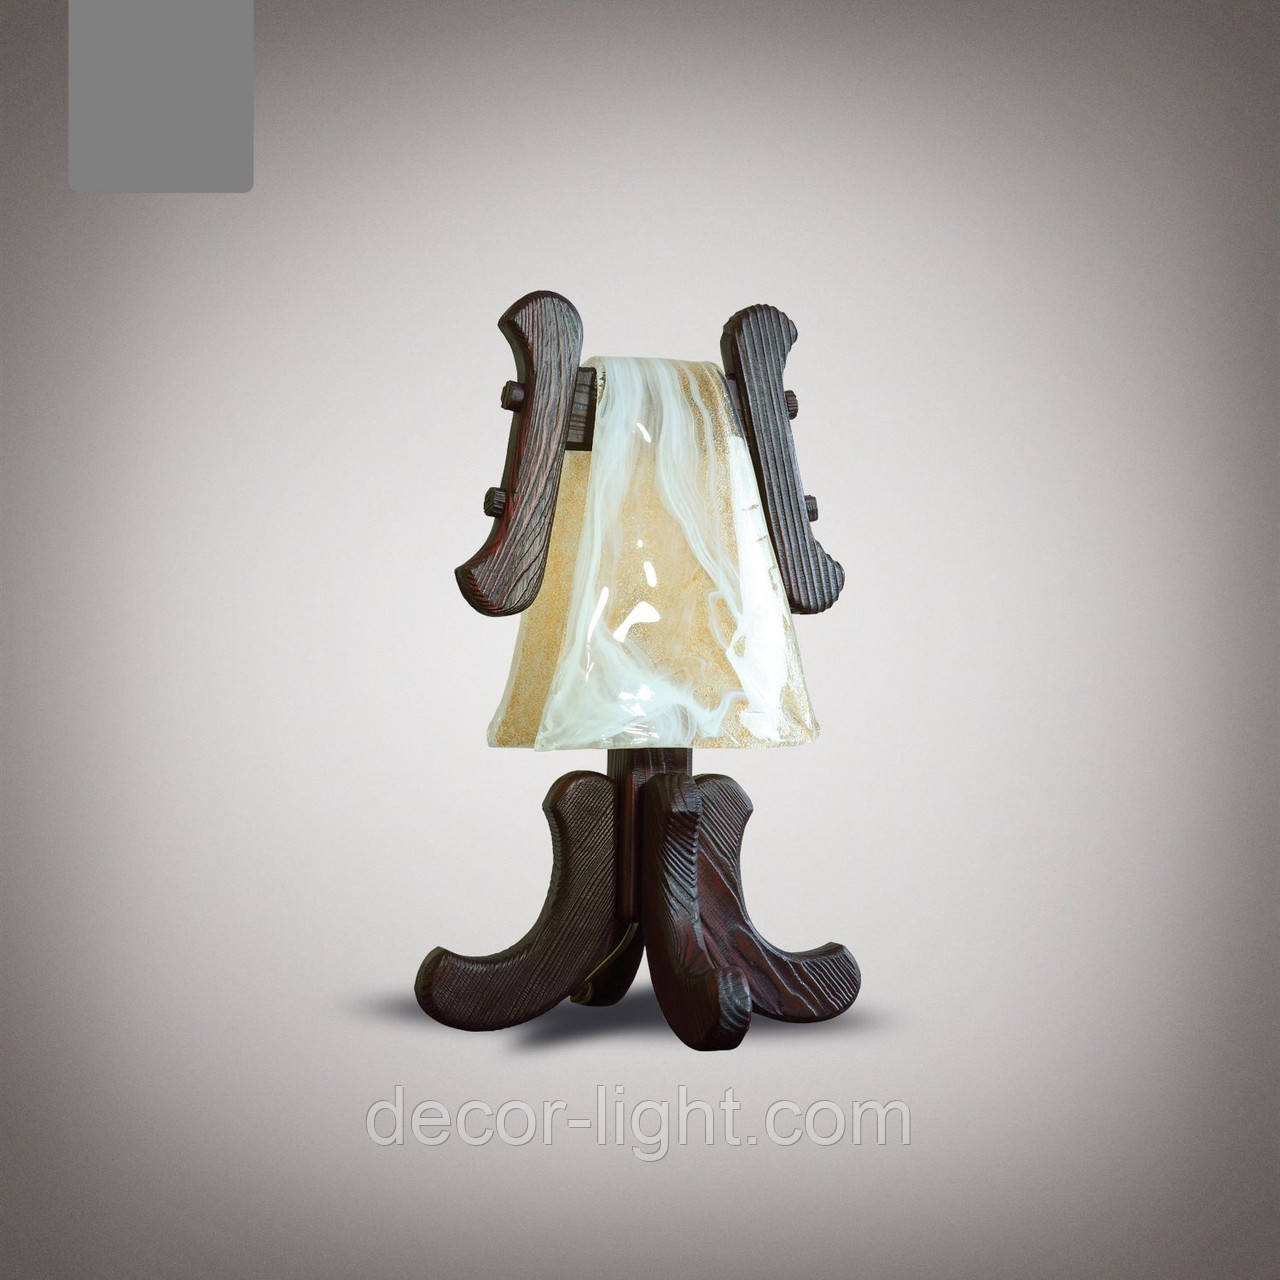 Настольная лампа деревянная  1400